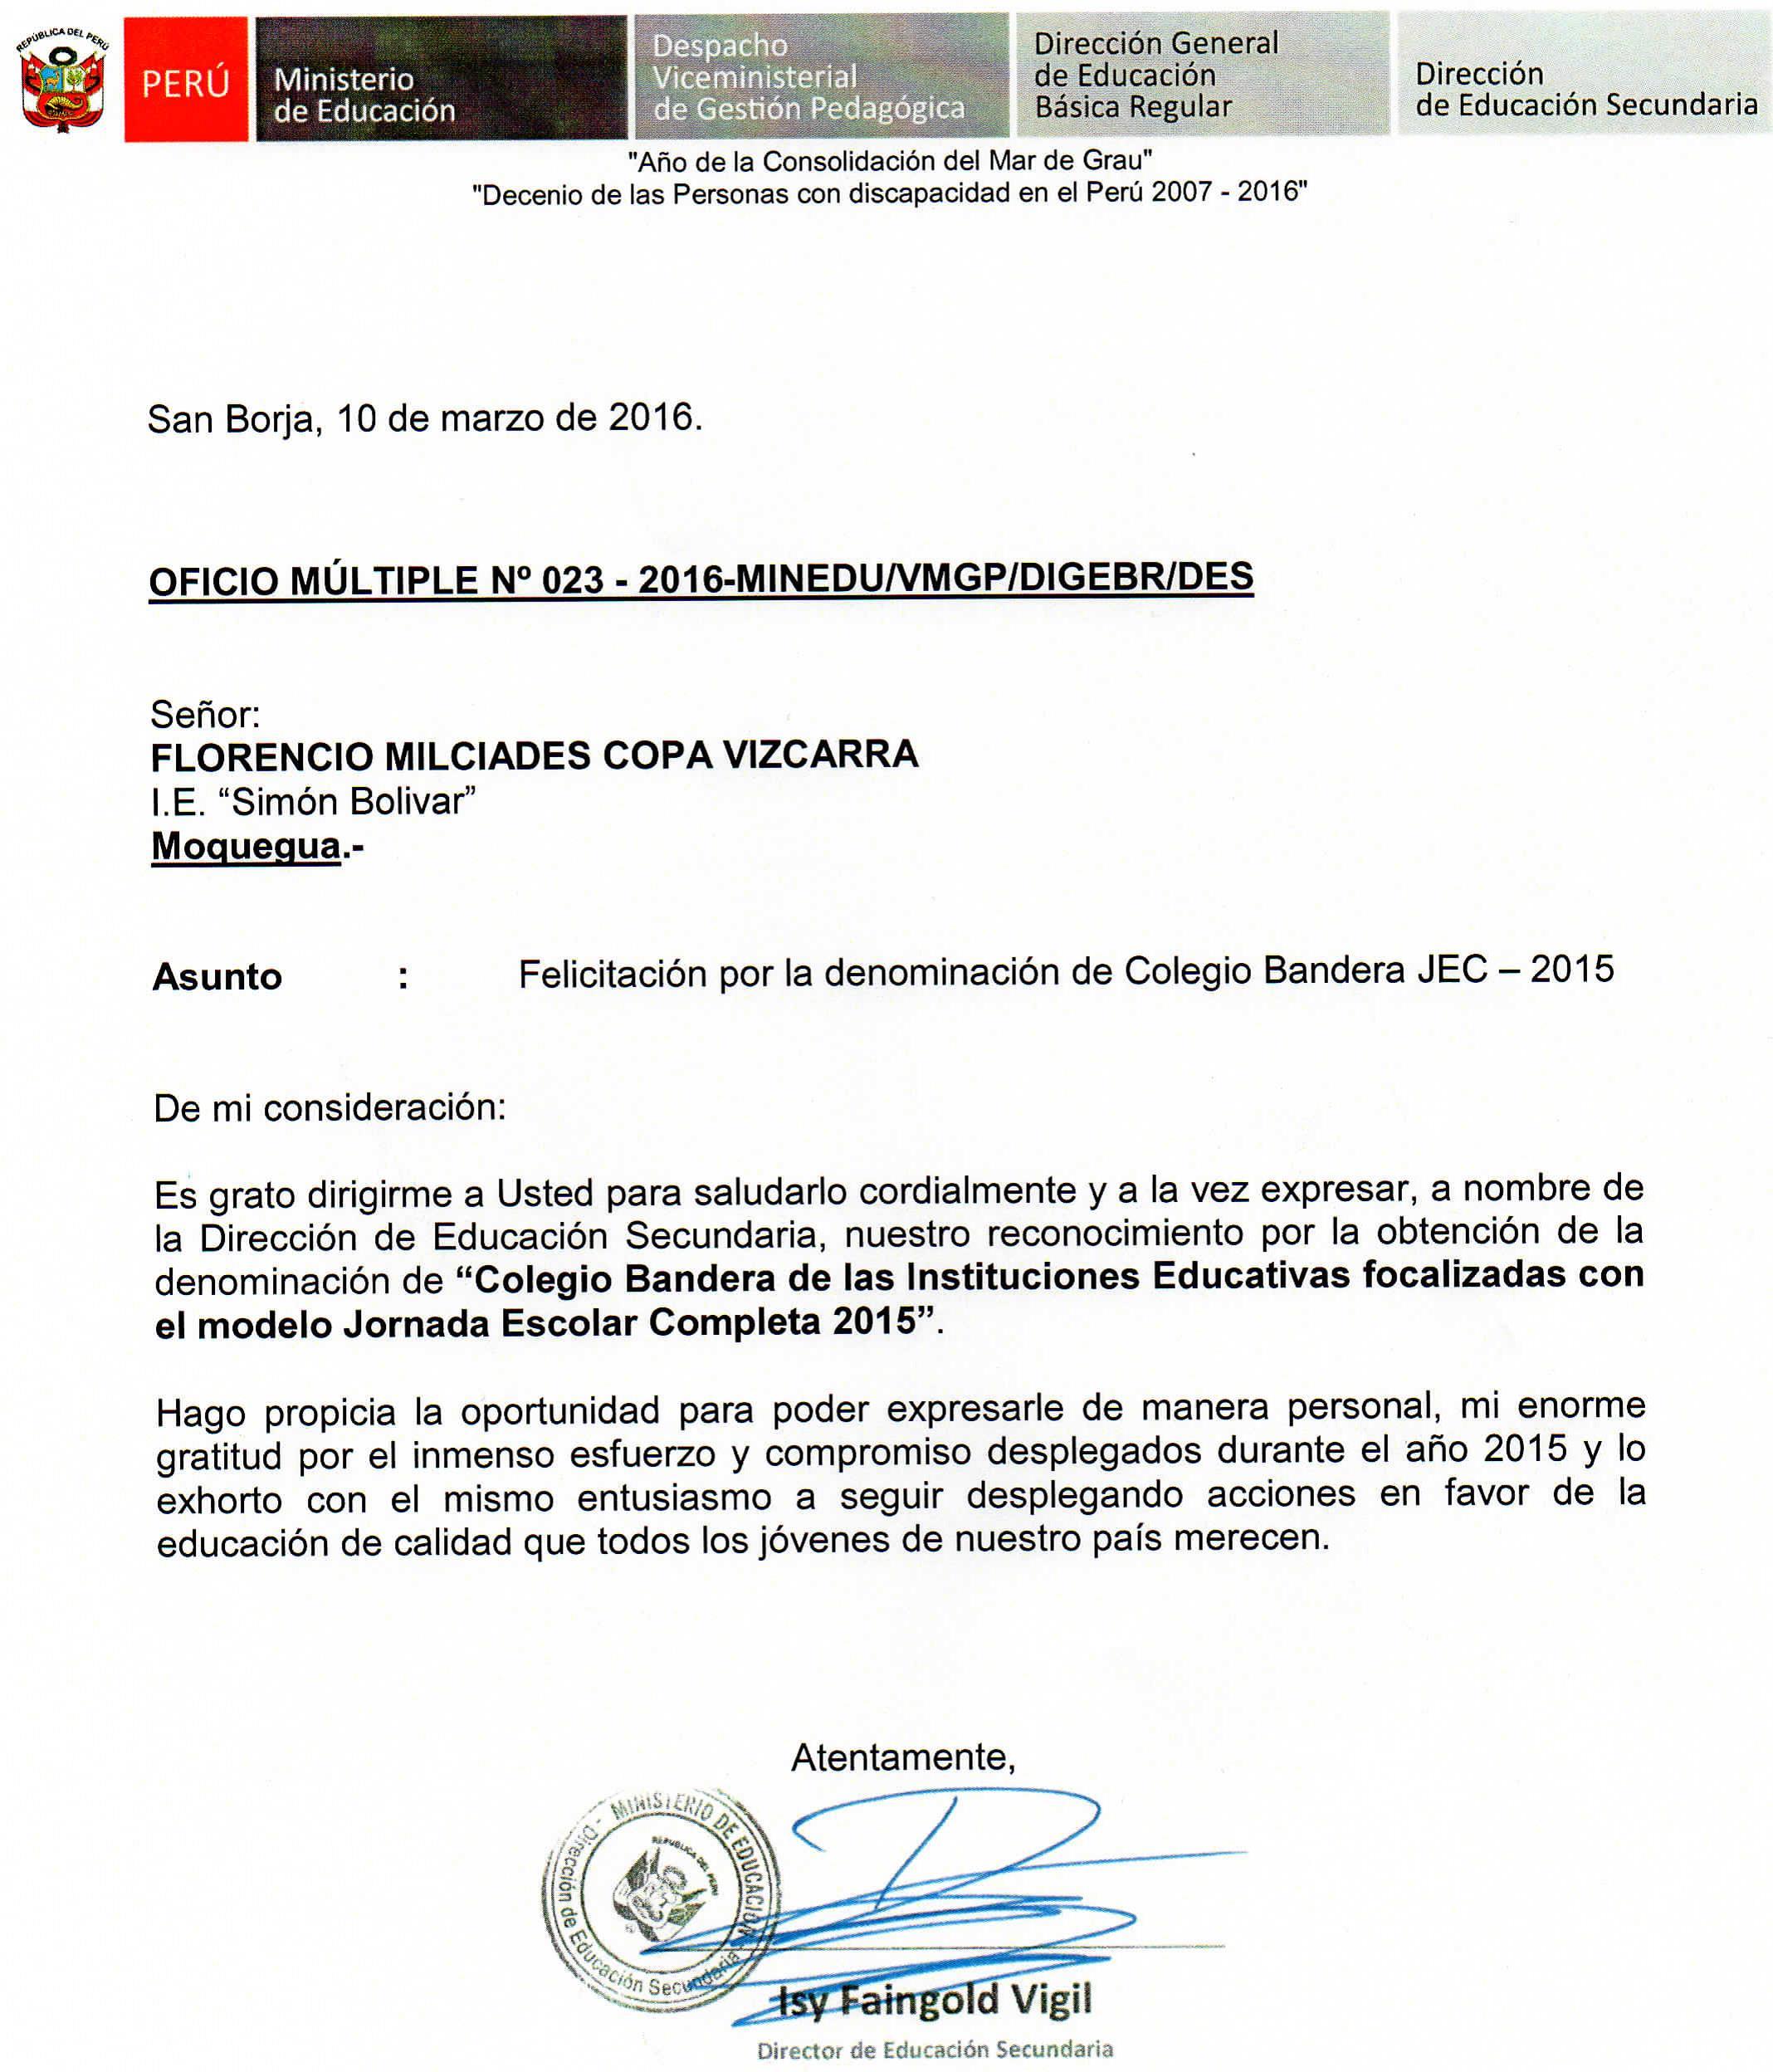 Simón Bolívar: Colegio Bandera, según el MINEDU.